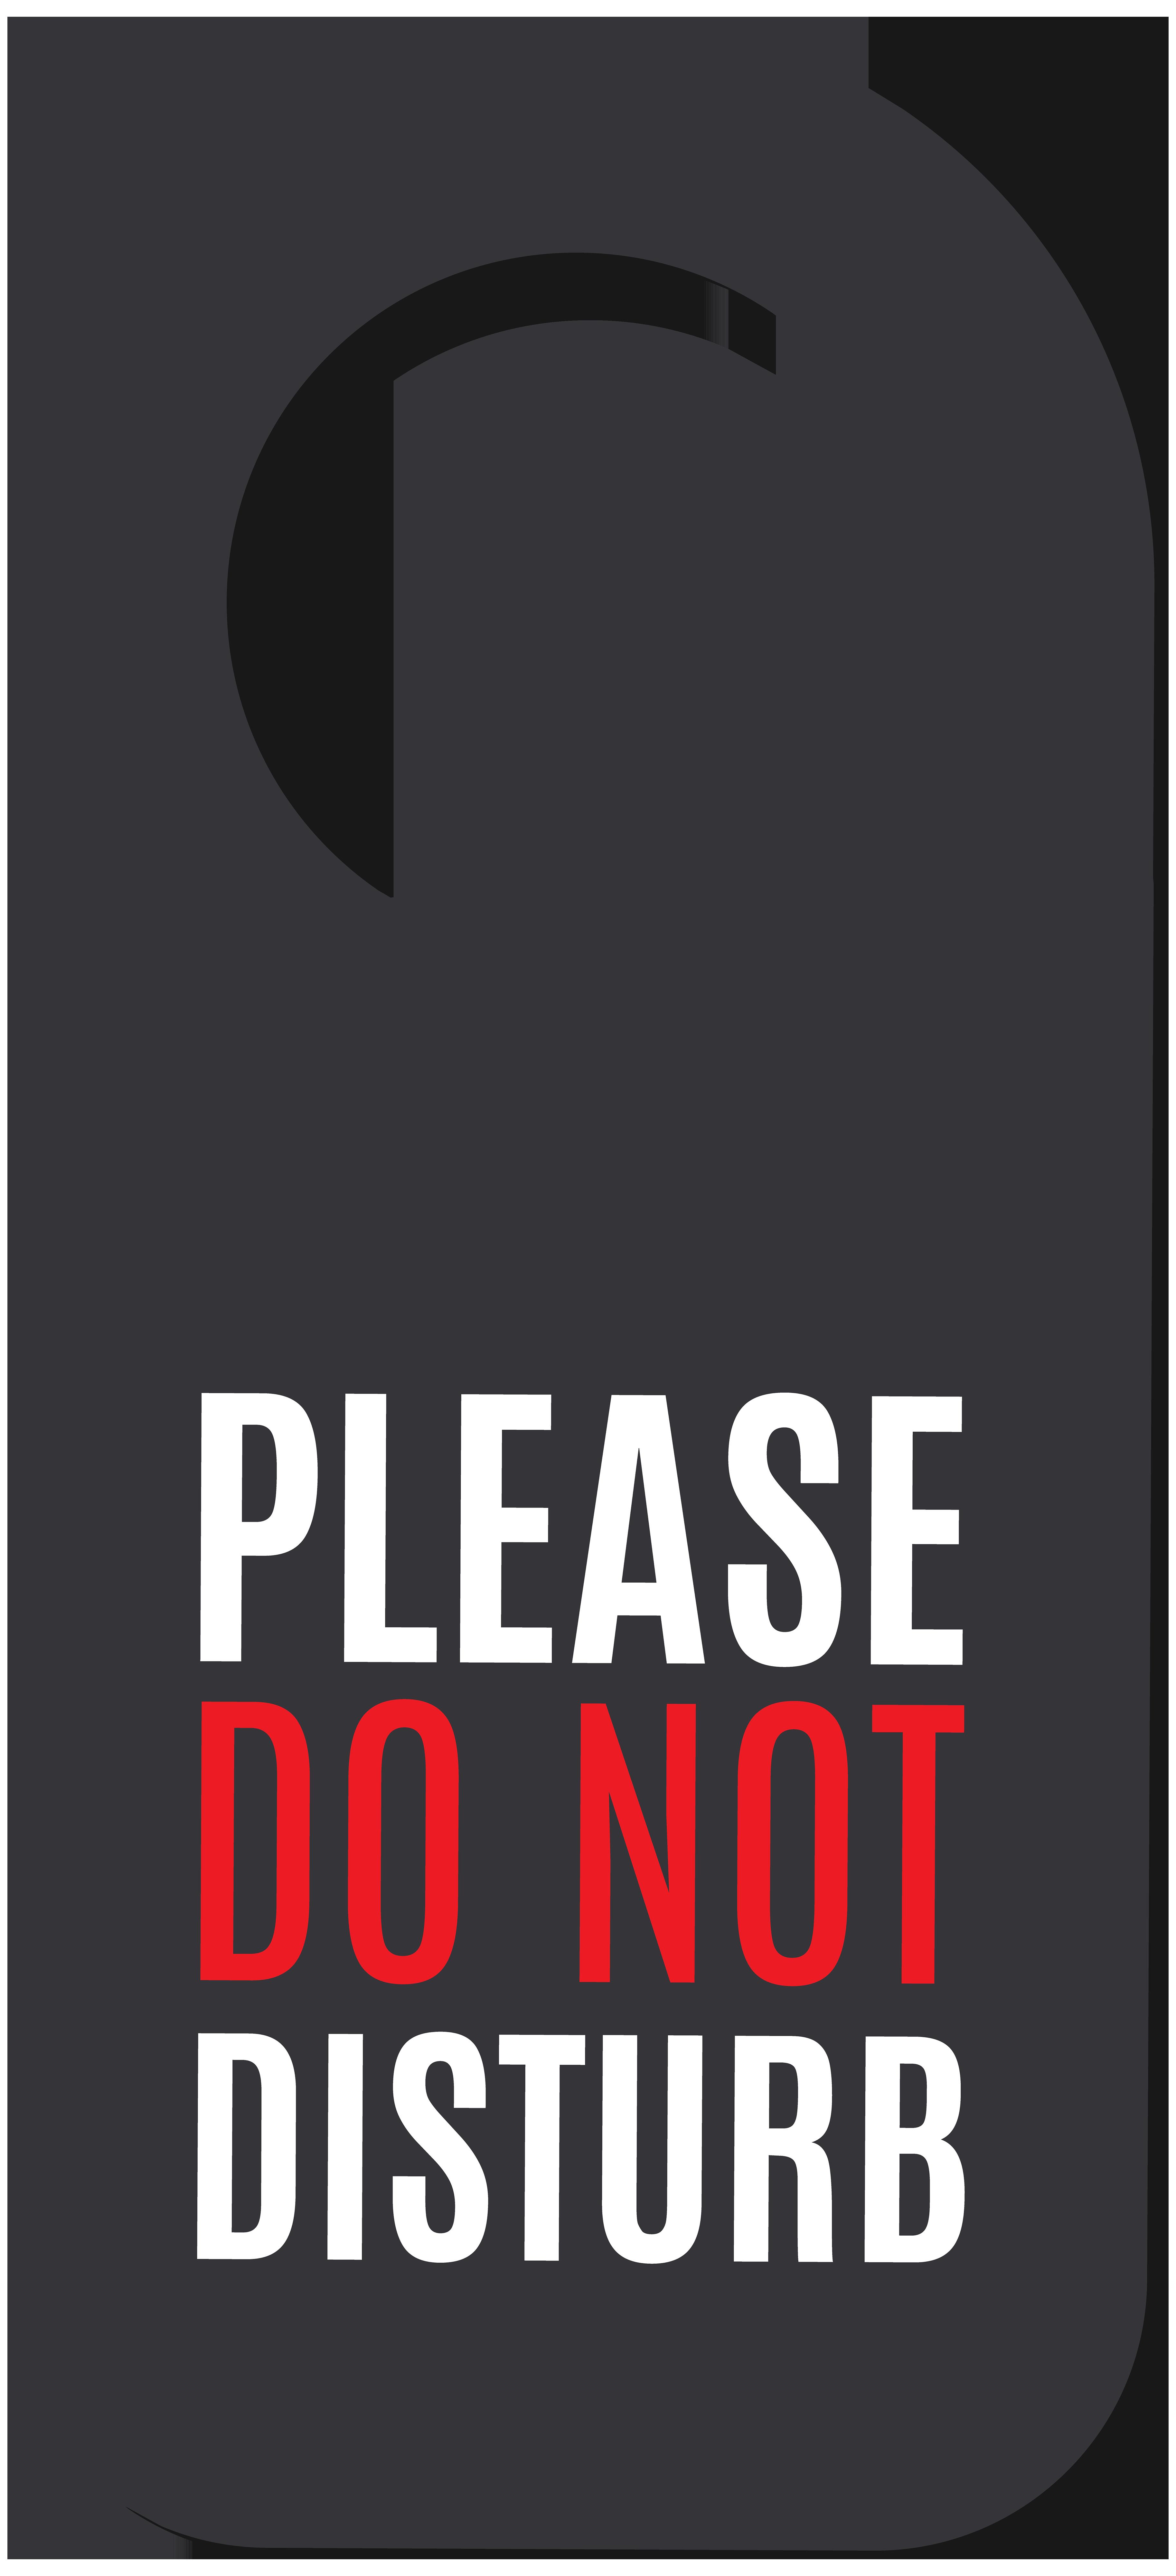 Please Do Not Disturb Label PNG Image.